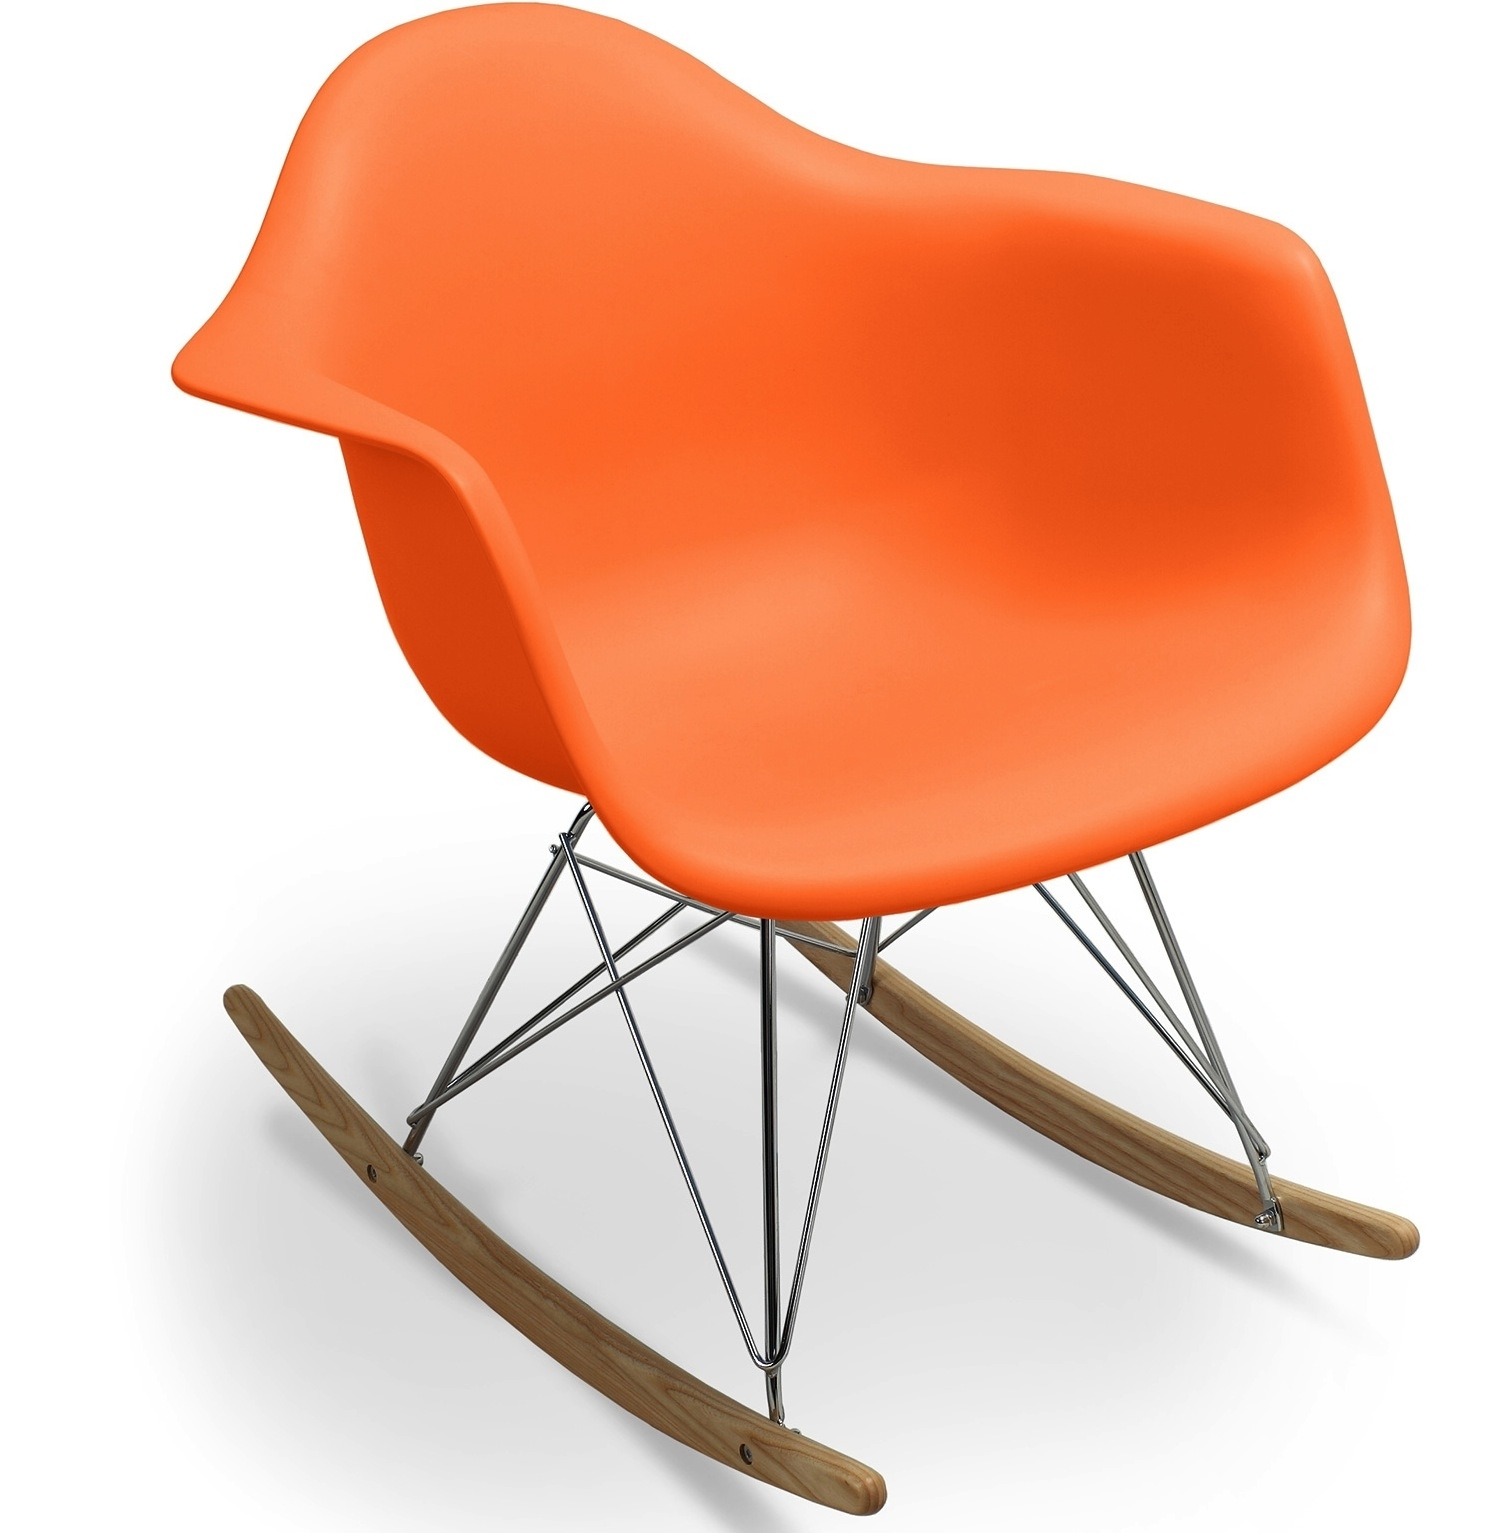 Fauteuil bascule orange mat inspir e charles eames - Fauteuil a bascule eames ...